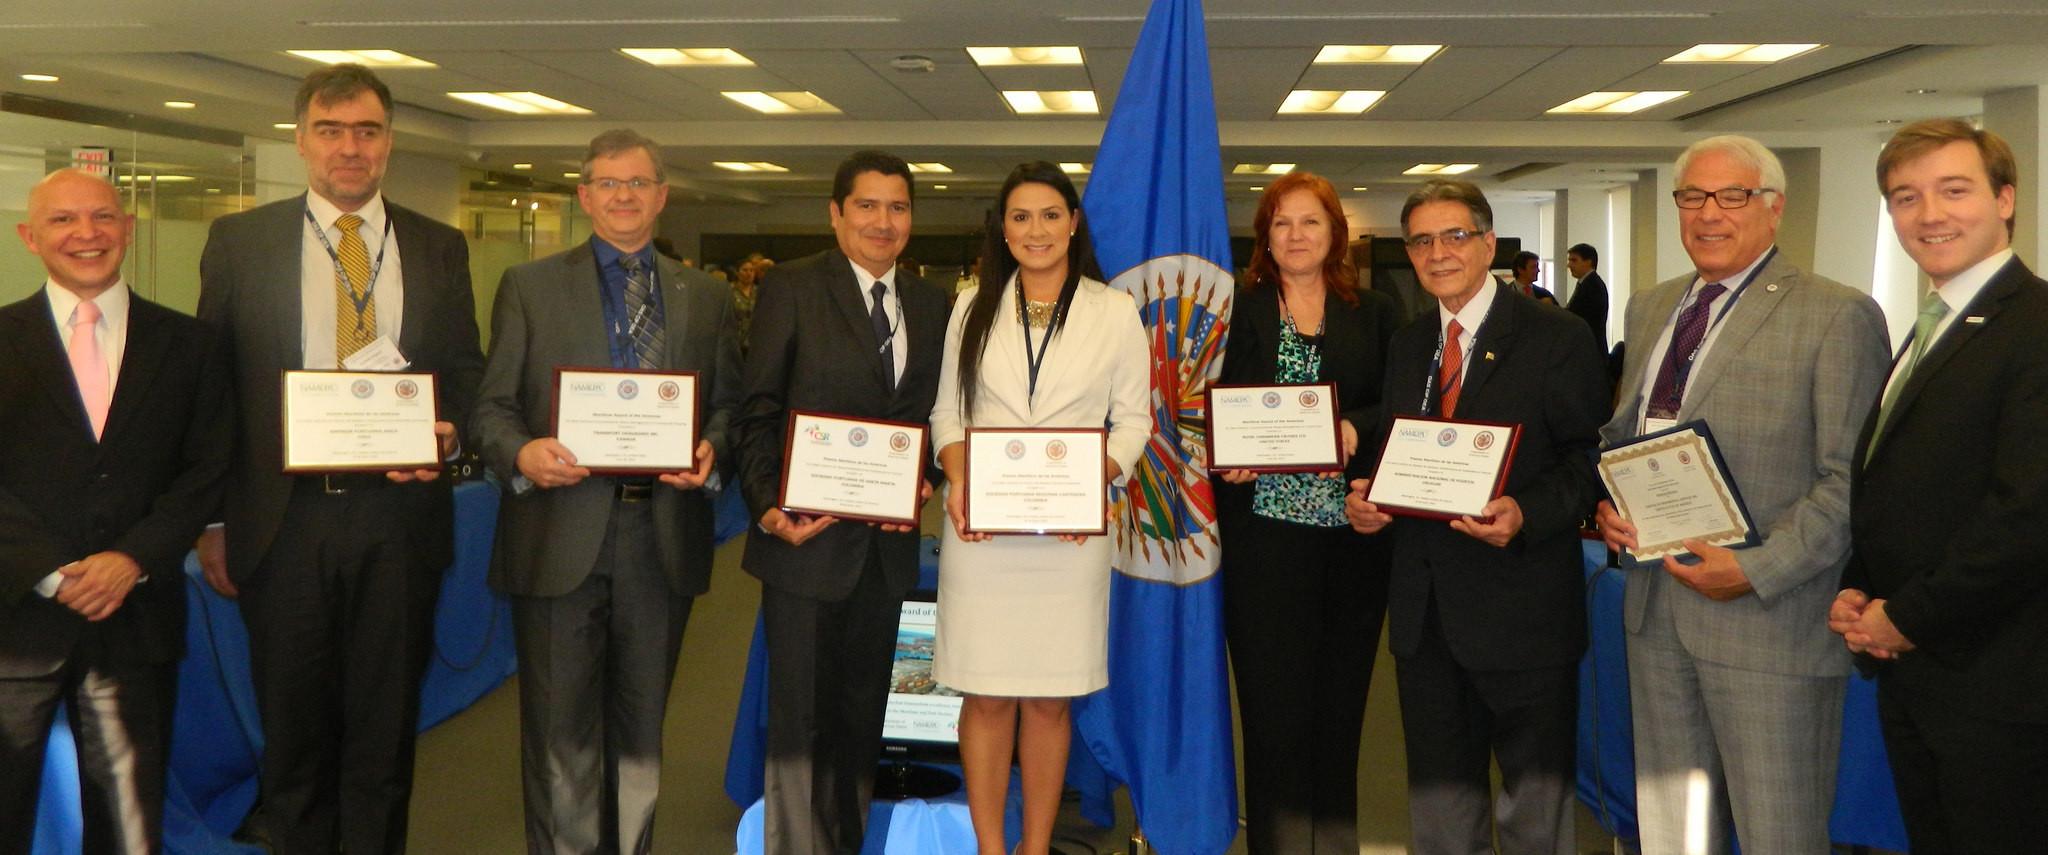 Maritime Award of the Americas